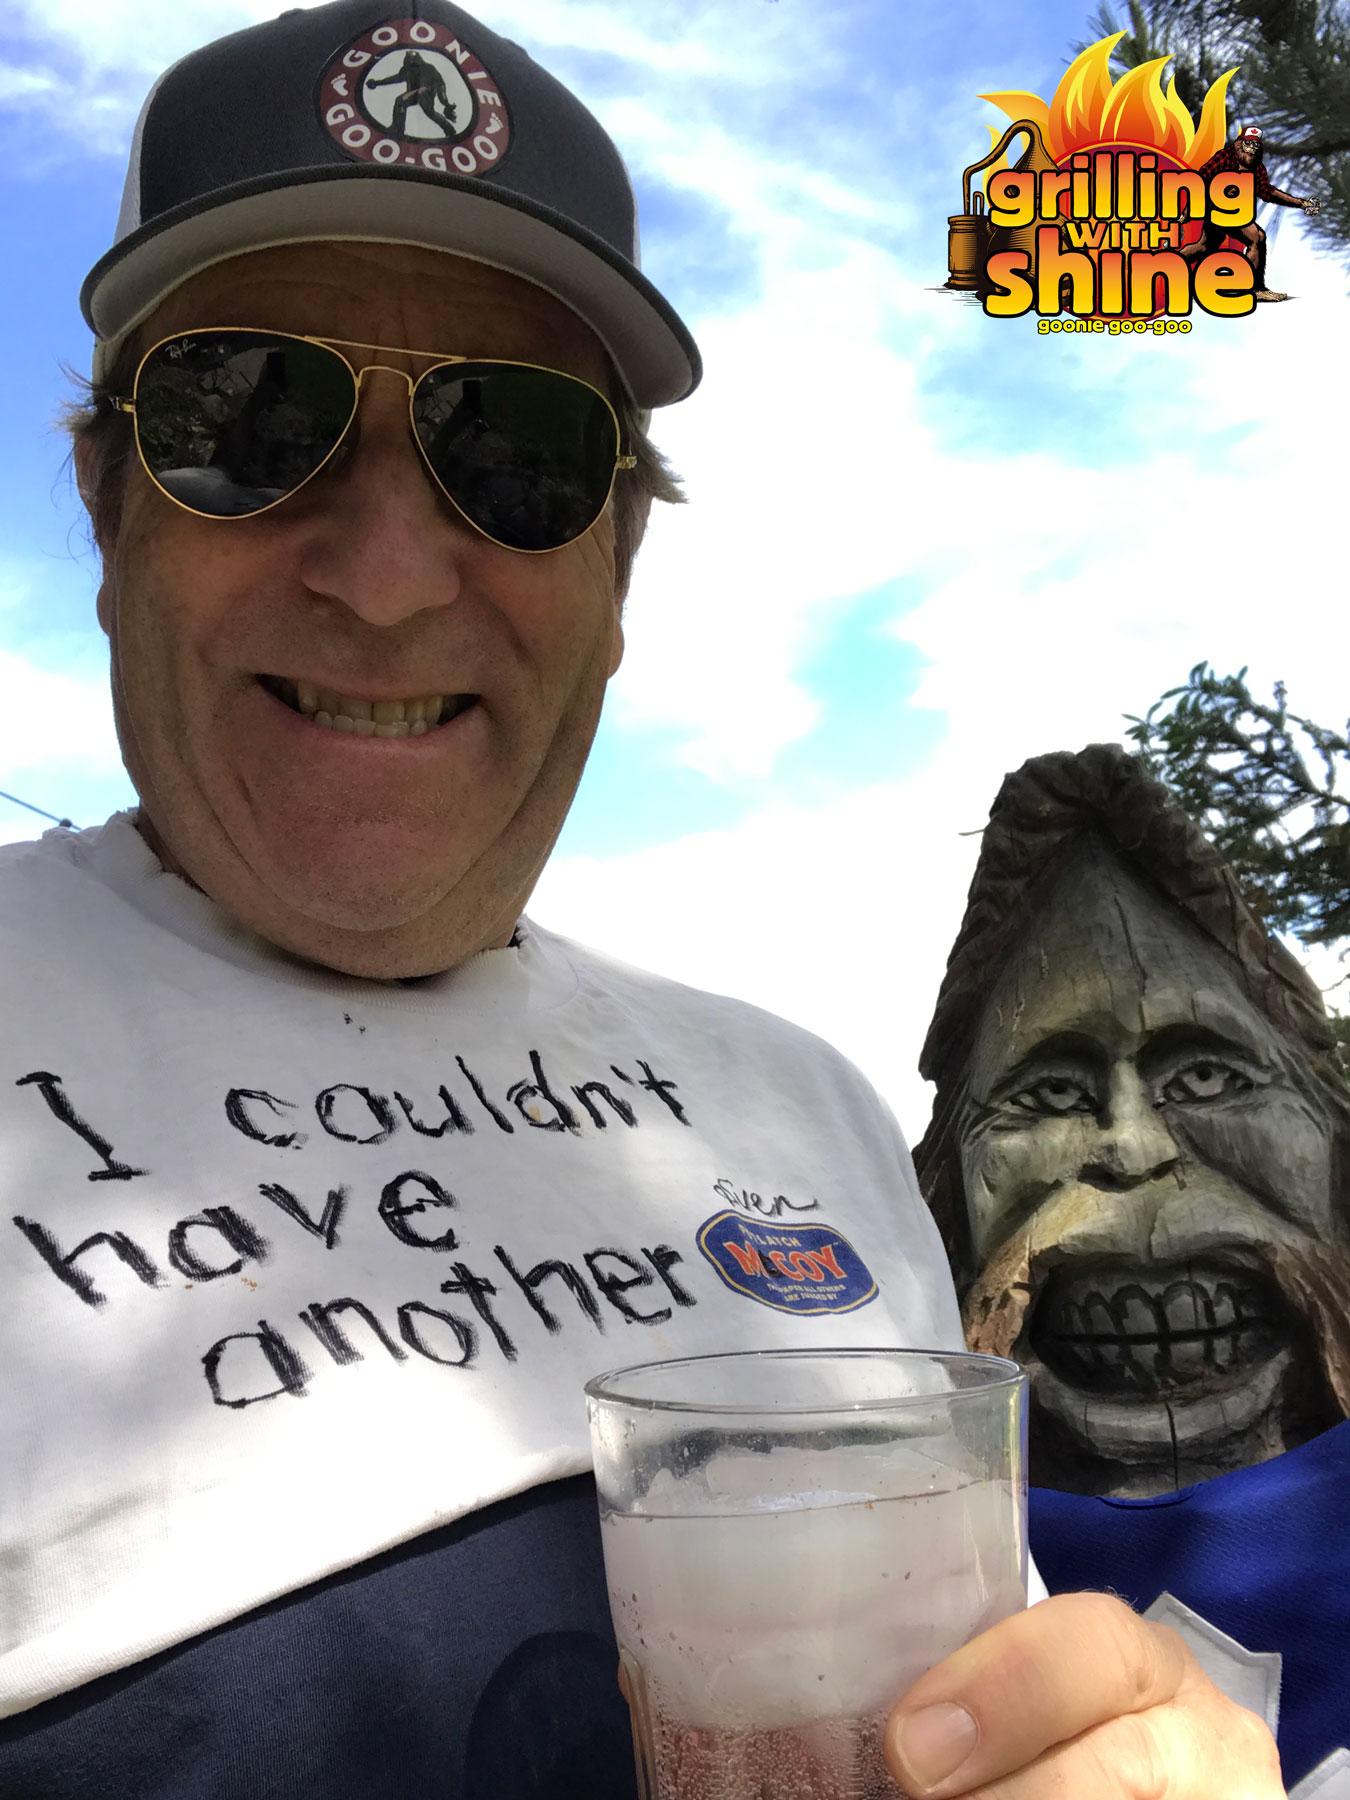 Sven Mcoy and Sasquatch enjoying a Gin-Shine